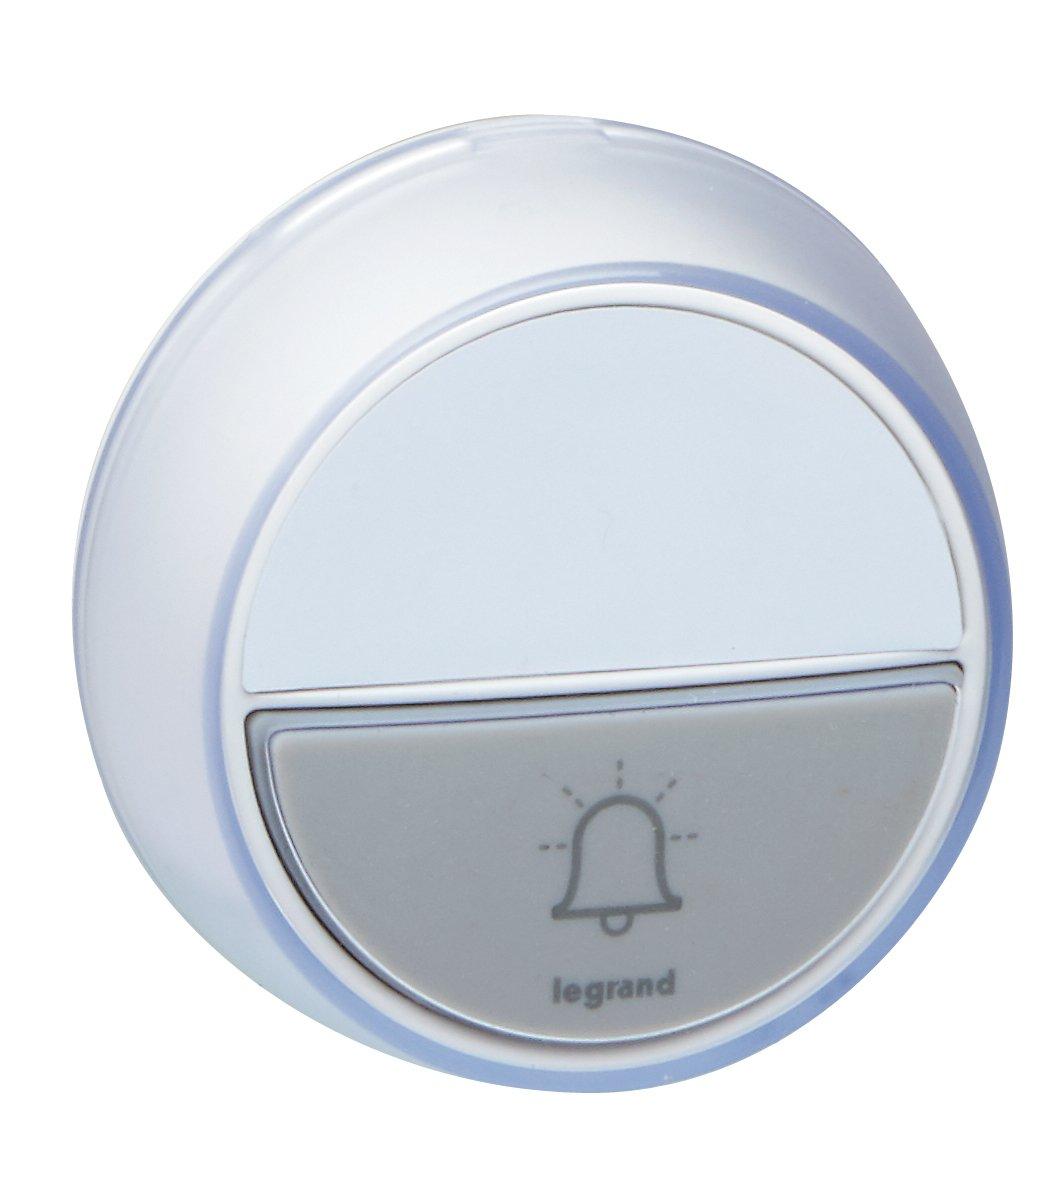 Legrand 094278 pulsador inalámbrico con LED para balizas de ...